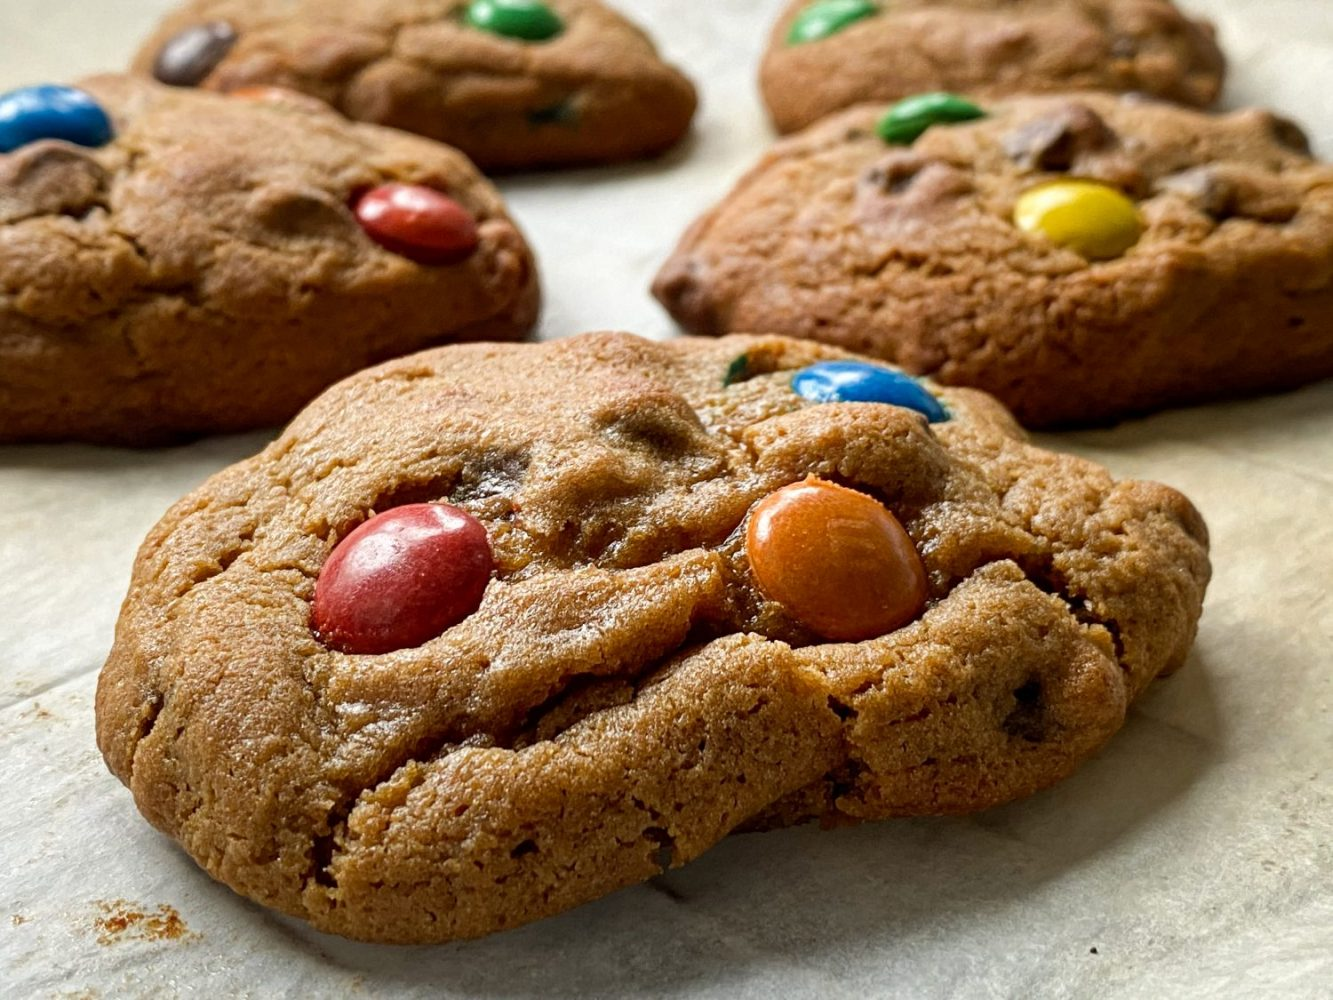 Cukorsokk – M&M's cookies